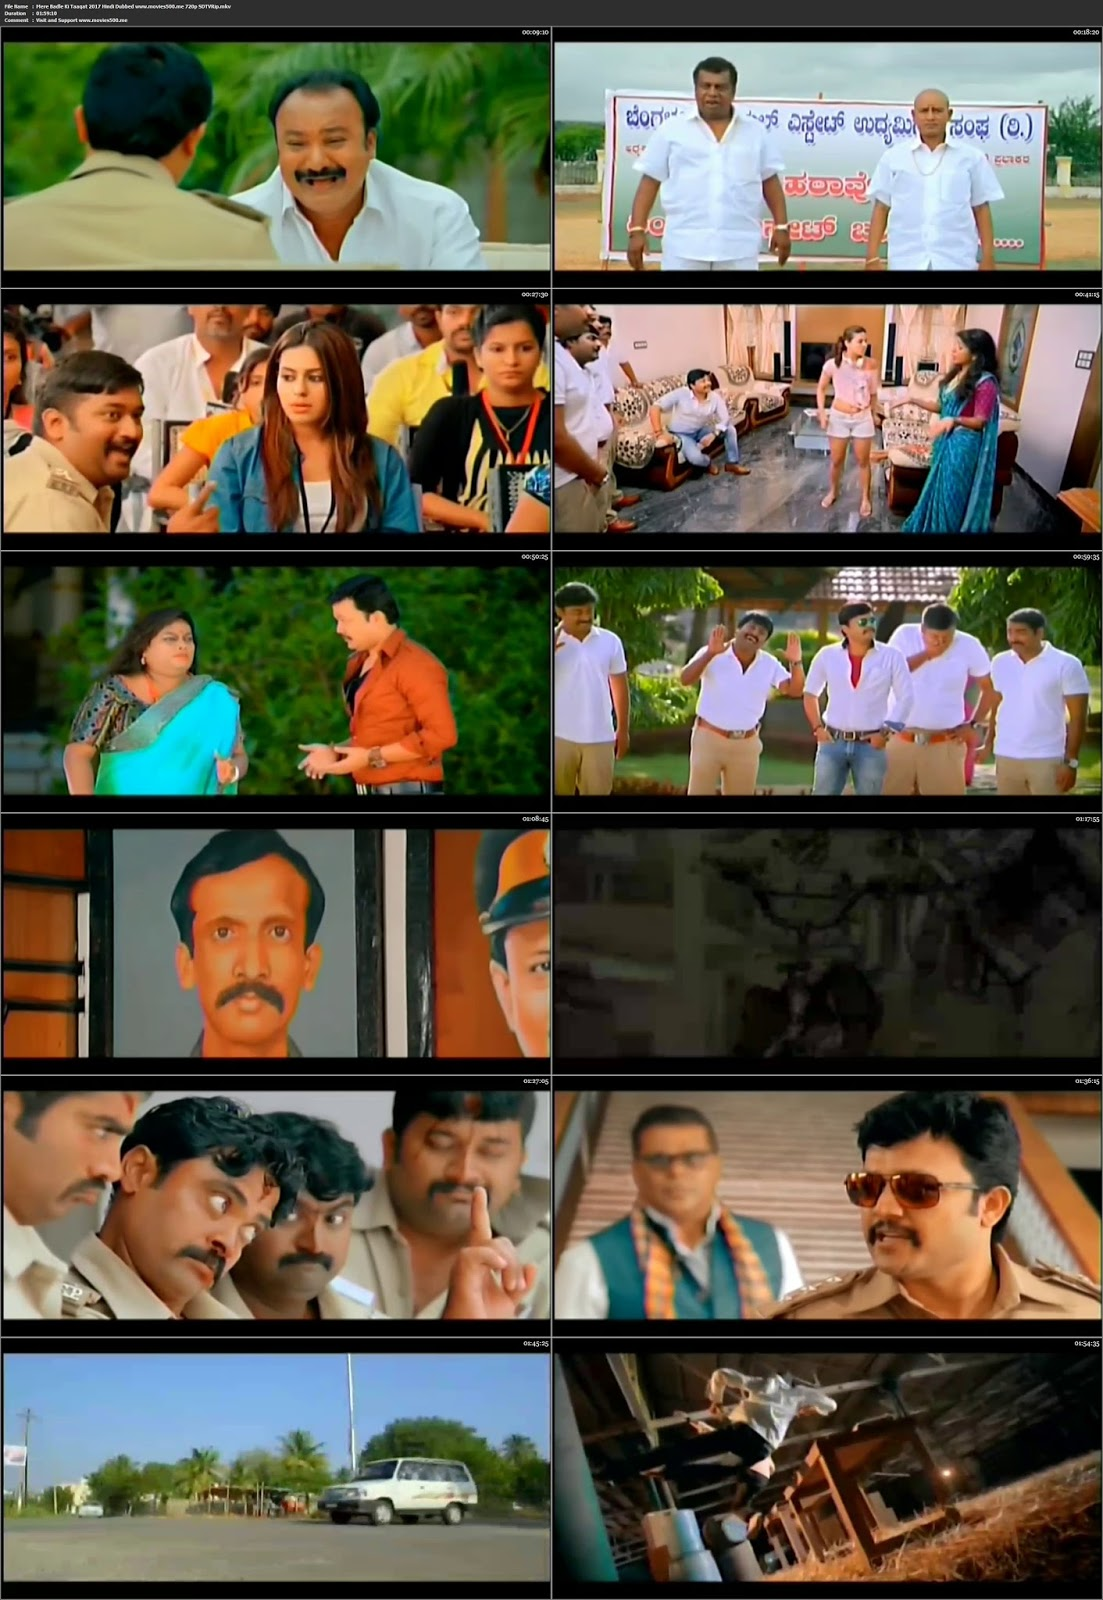 Mere Badle Ki Taaqat 2017 Hindi Dubbed Full Movie SDTVRip 720p at softwaresonly.com